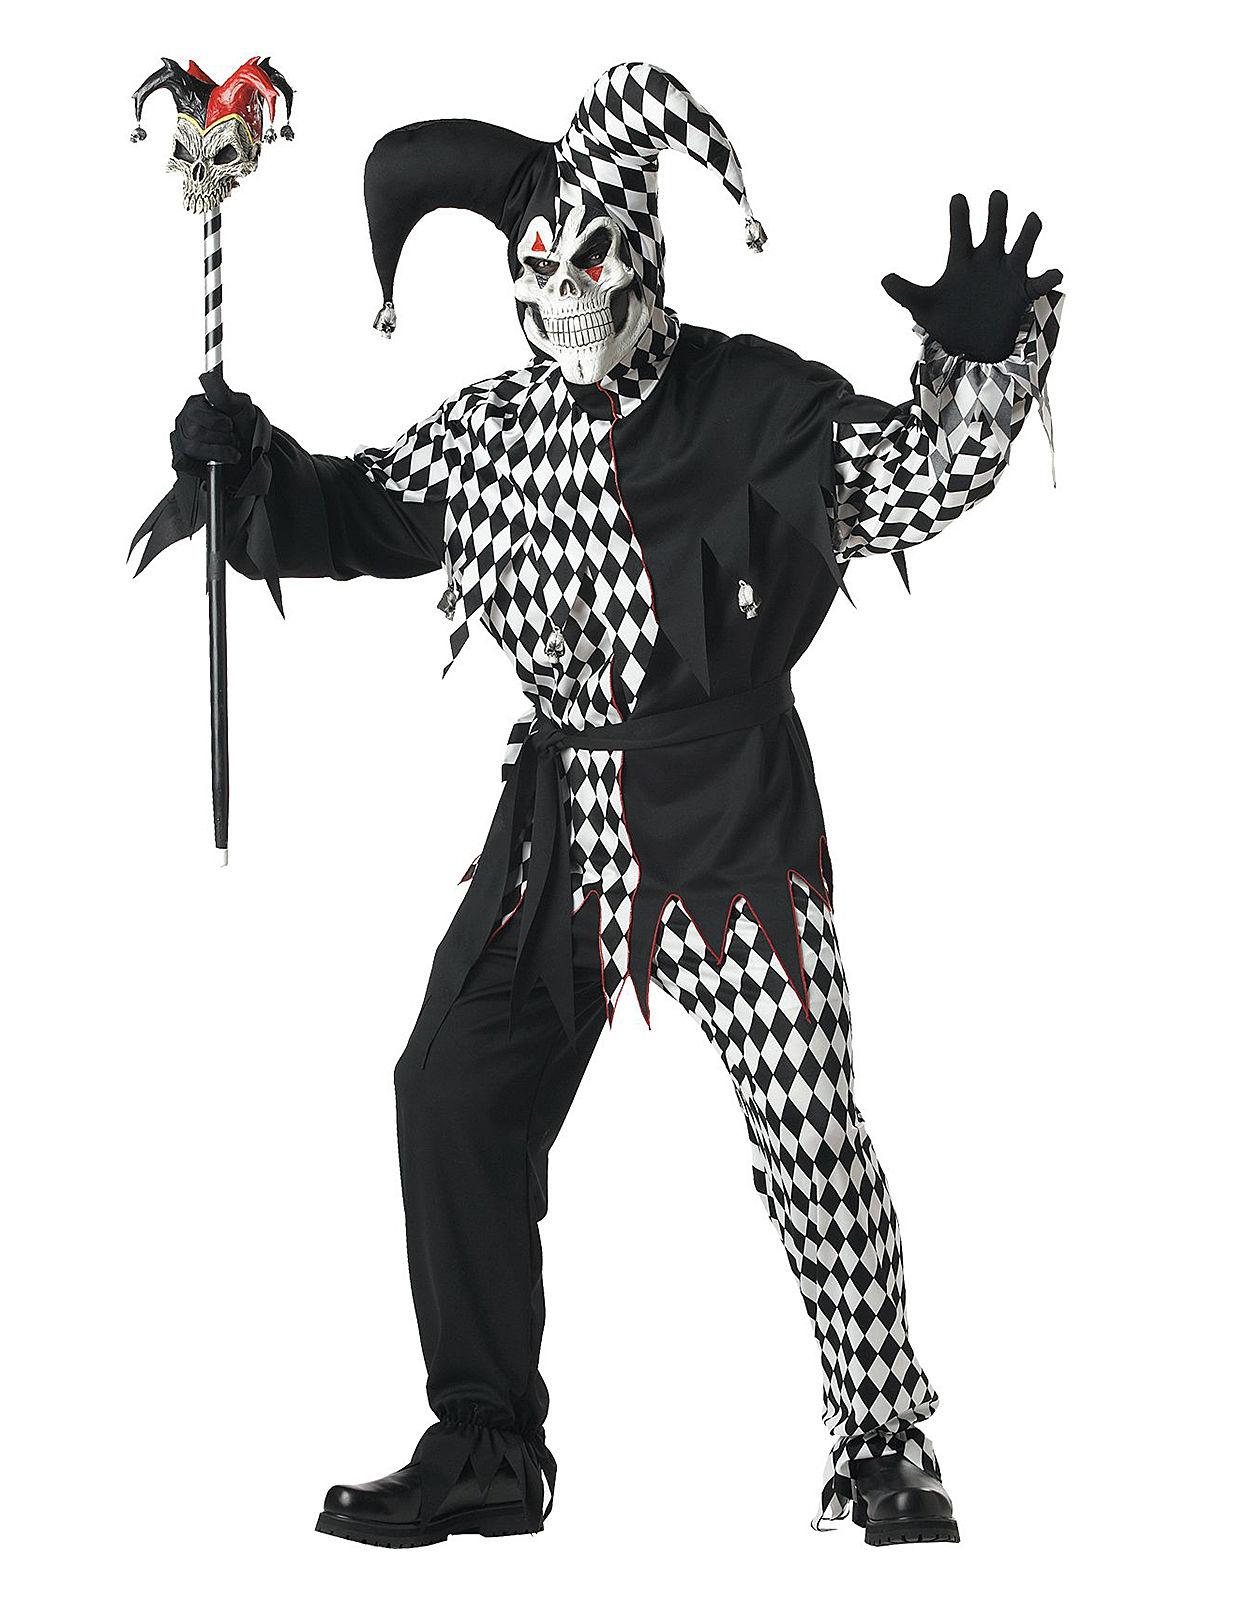 b ser clown harlekin halloween kost m schwarz weiss. Black Bedroom Furniture Sets. Home Design Ideas